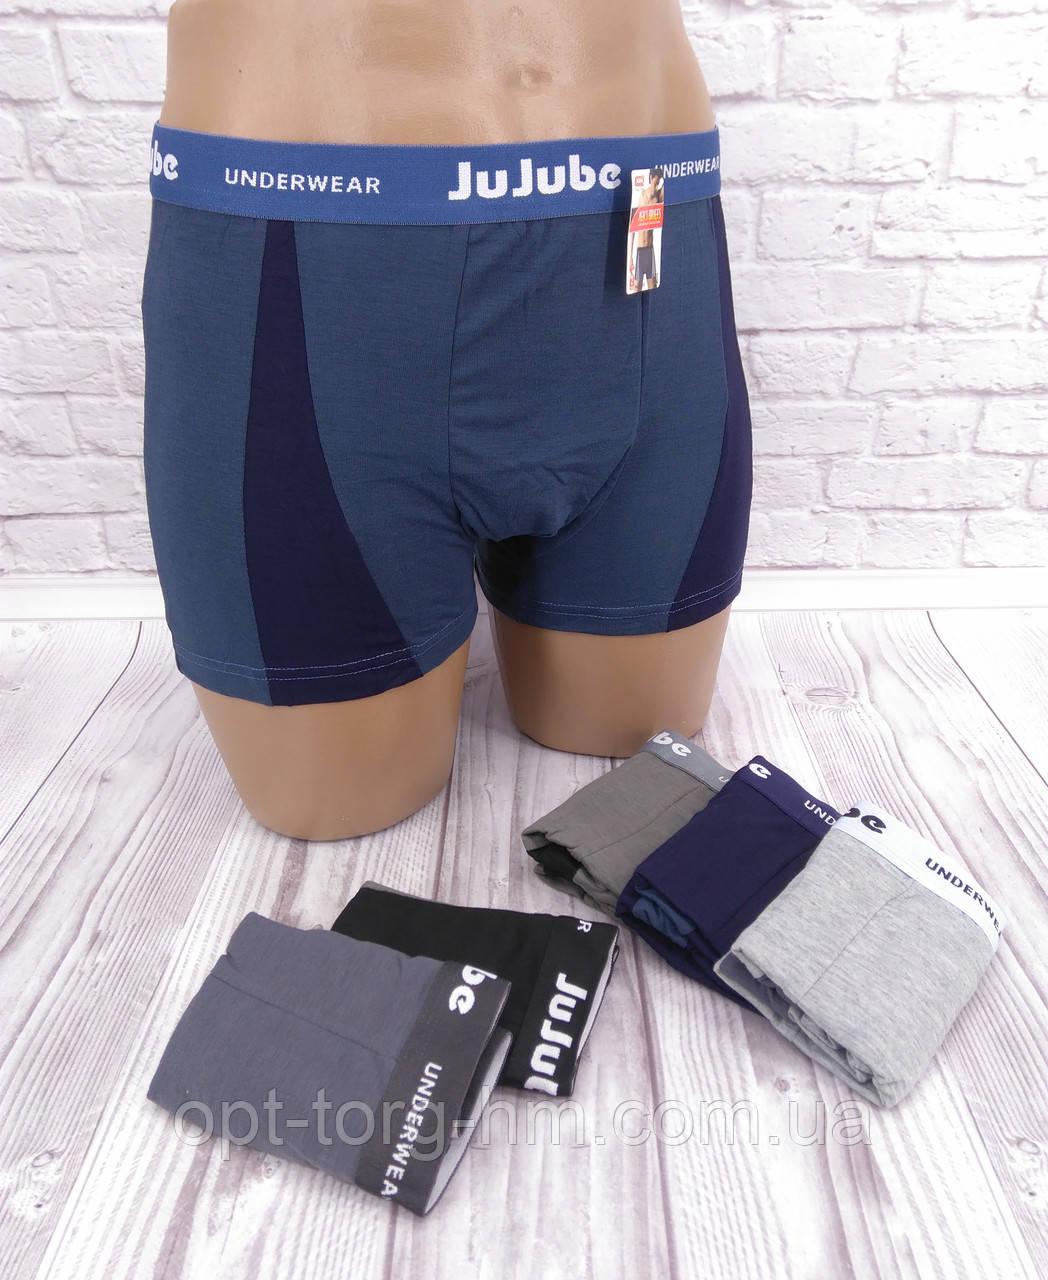 Мужские трусы боксеры JuJuBe Размер XL  (Маломерят)